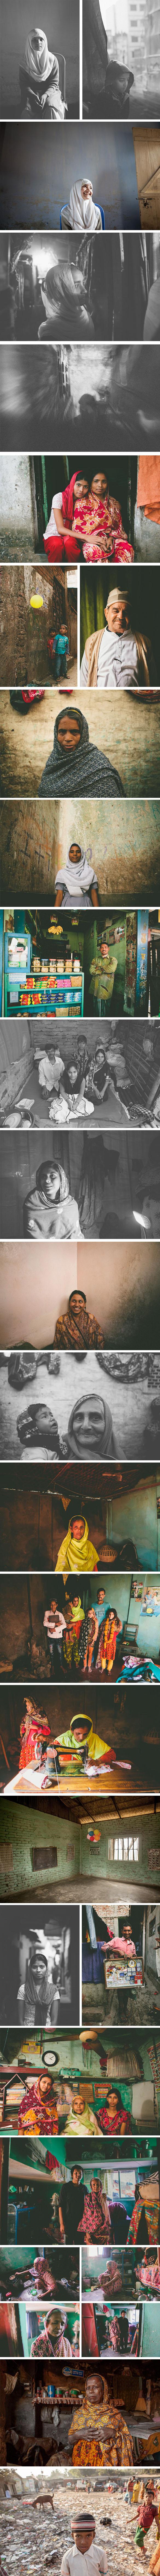 bangladesh_blog